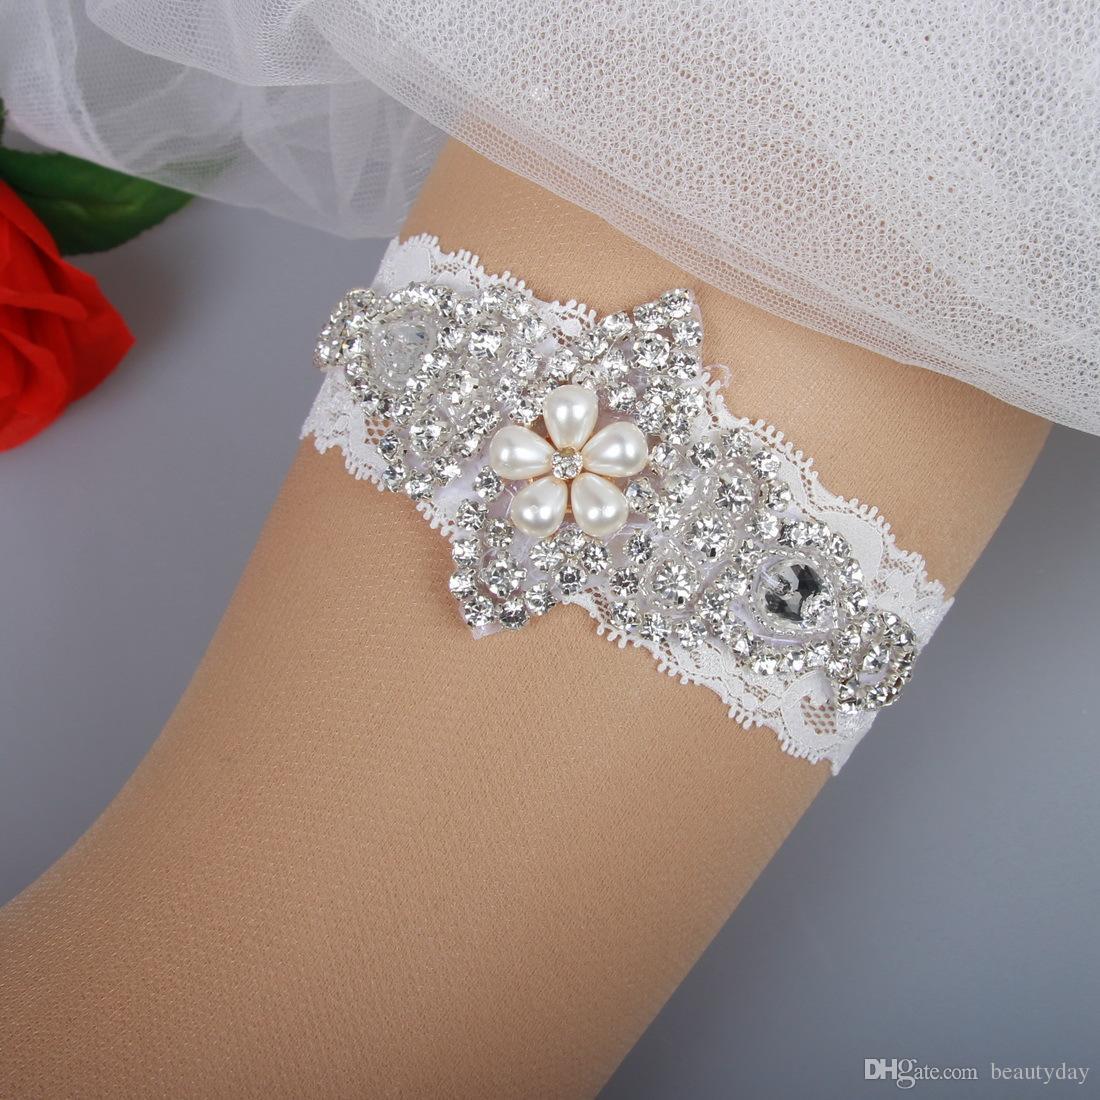 Bridal Garters Lace Rhinestones Pearls Beads Vintage Prom